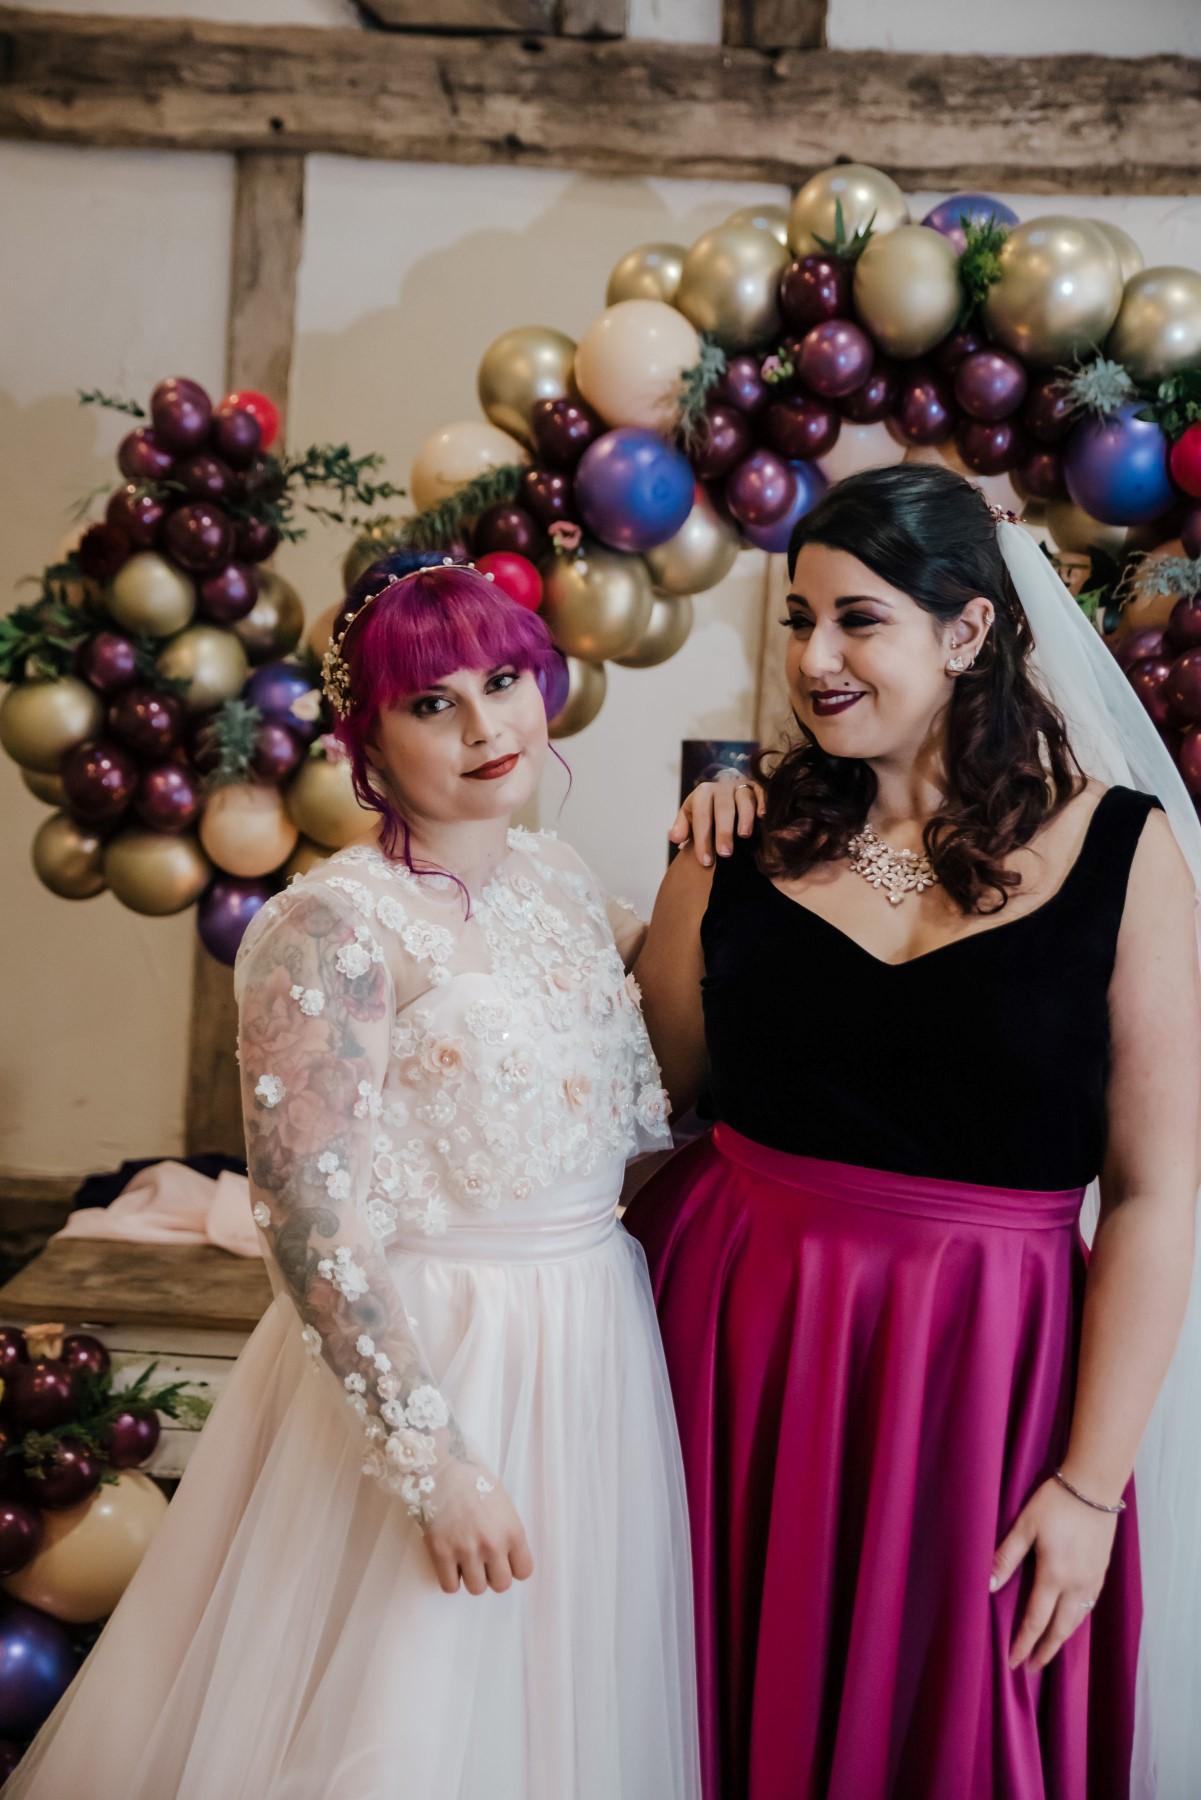 Roshni Photography- Barn Wedding Shoot- Smiles